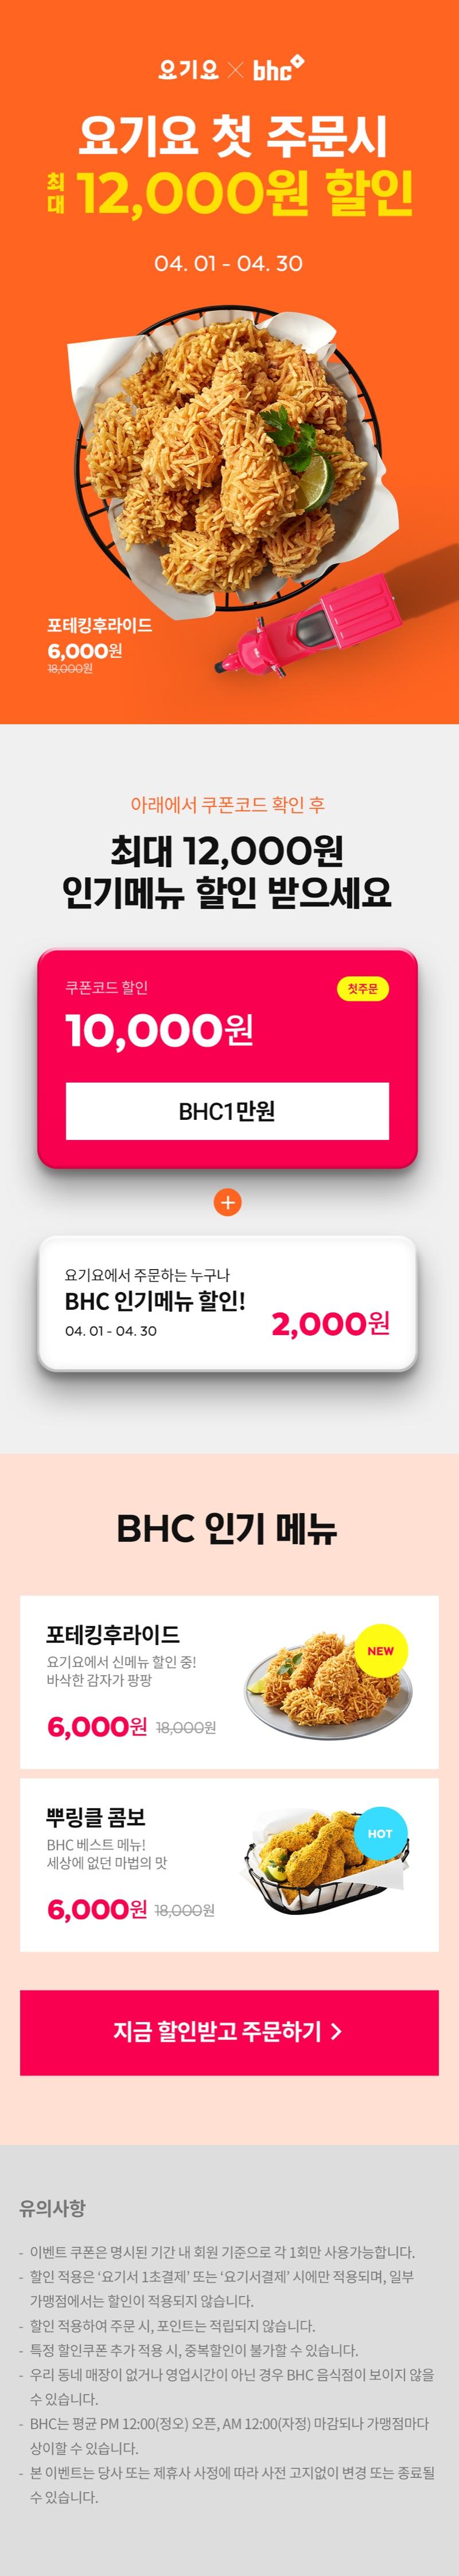 20210331_BHCYGY_Eventpage.jpg